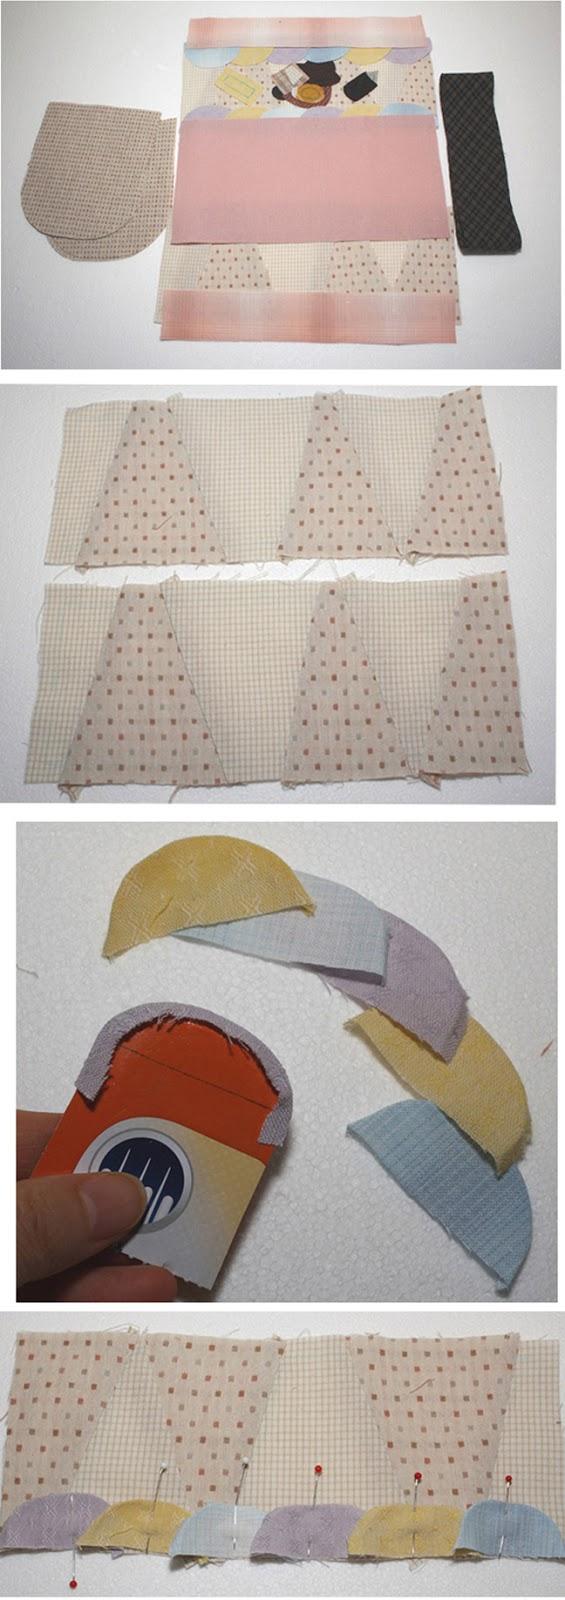 Women bags Patchwork tie-fabric clutch.  DIY step-by-step tutorial. Косметичка или клатч в технике пэтчворк